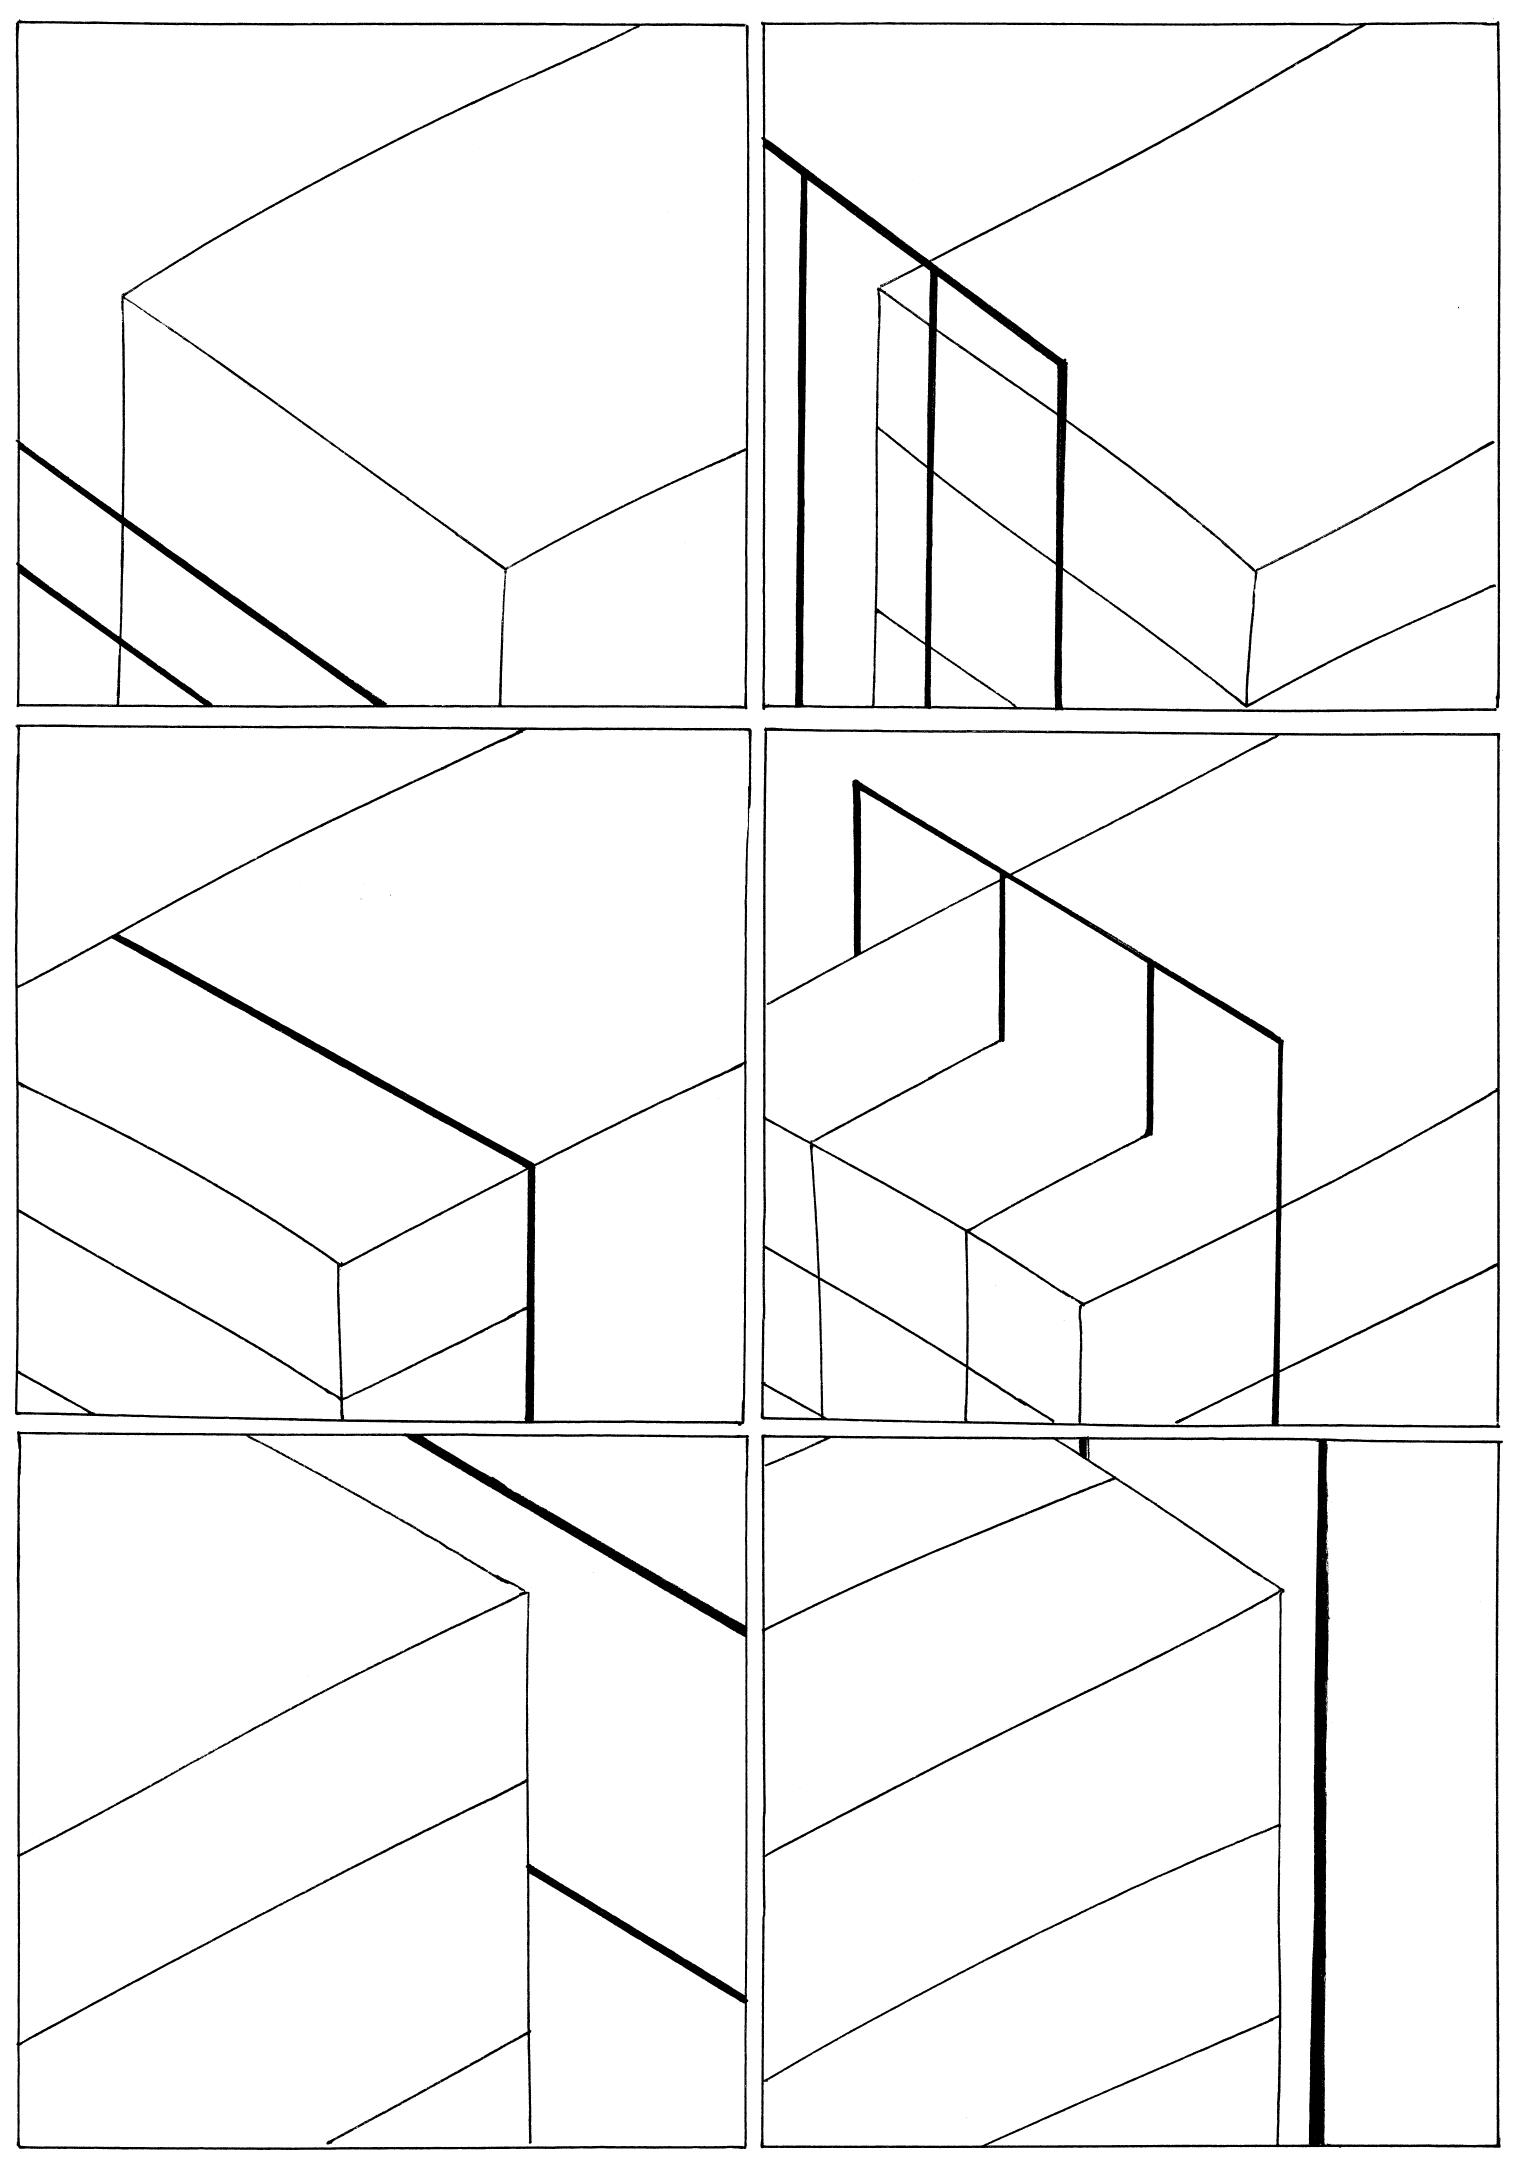 QQMAGV__complet-56